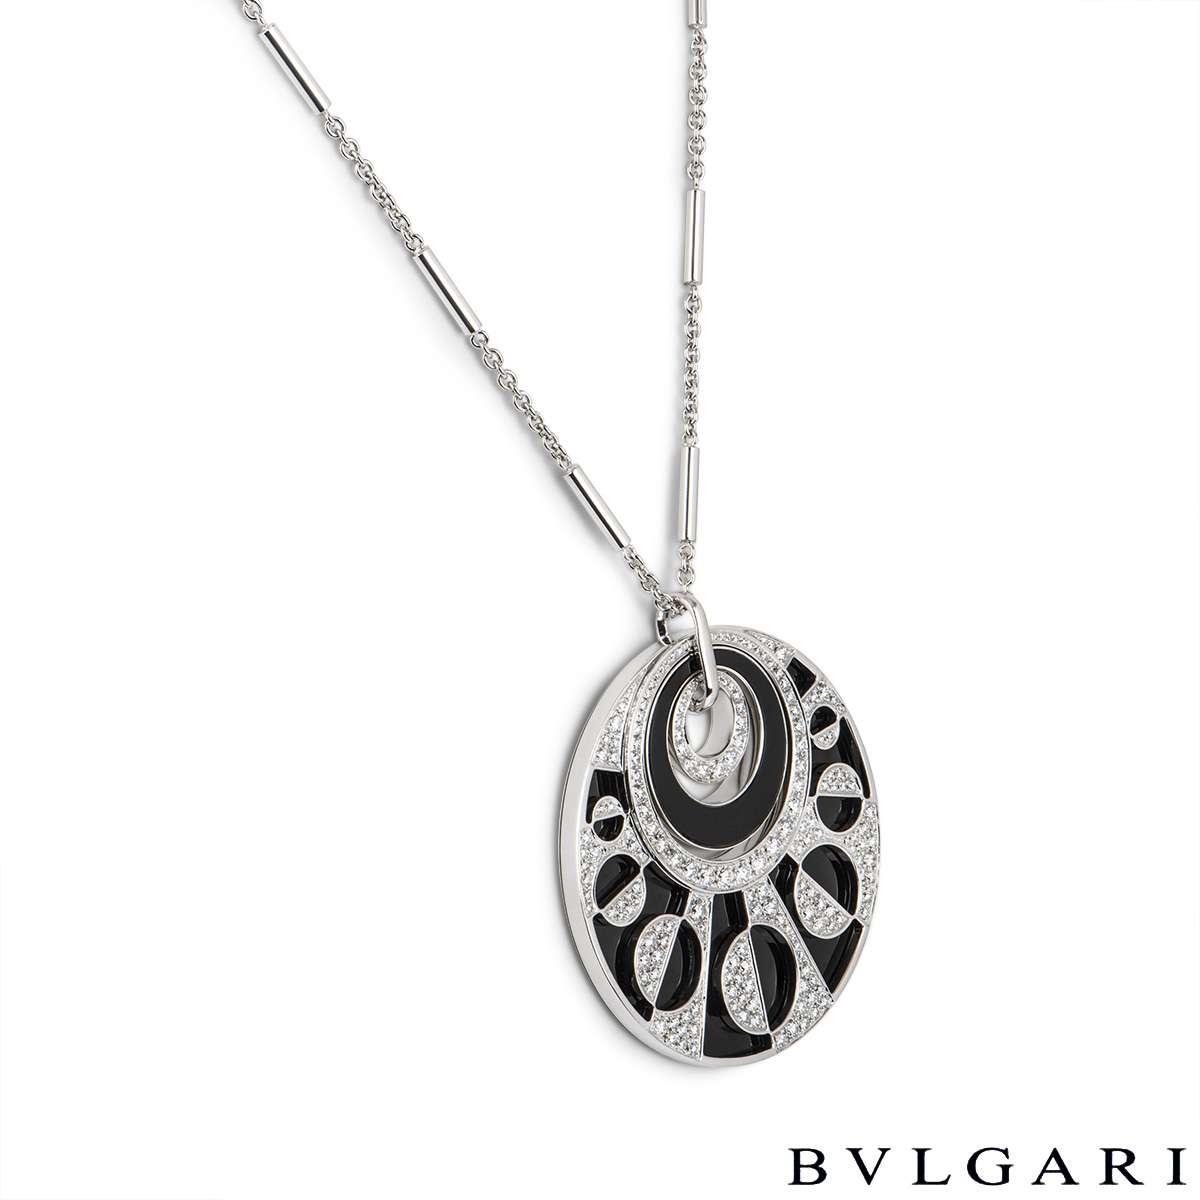 Bvlgari White Gold Diamond & Onyx Intarsio Large Necklace